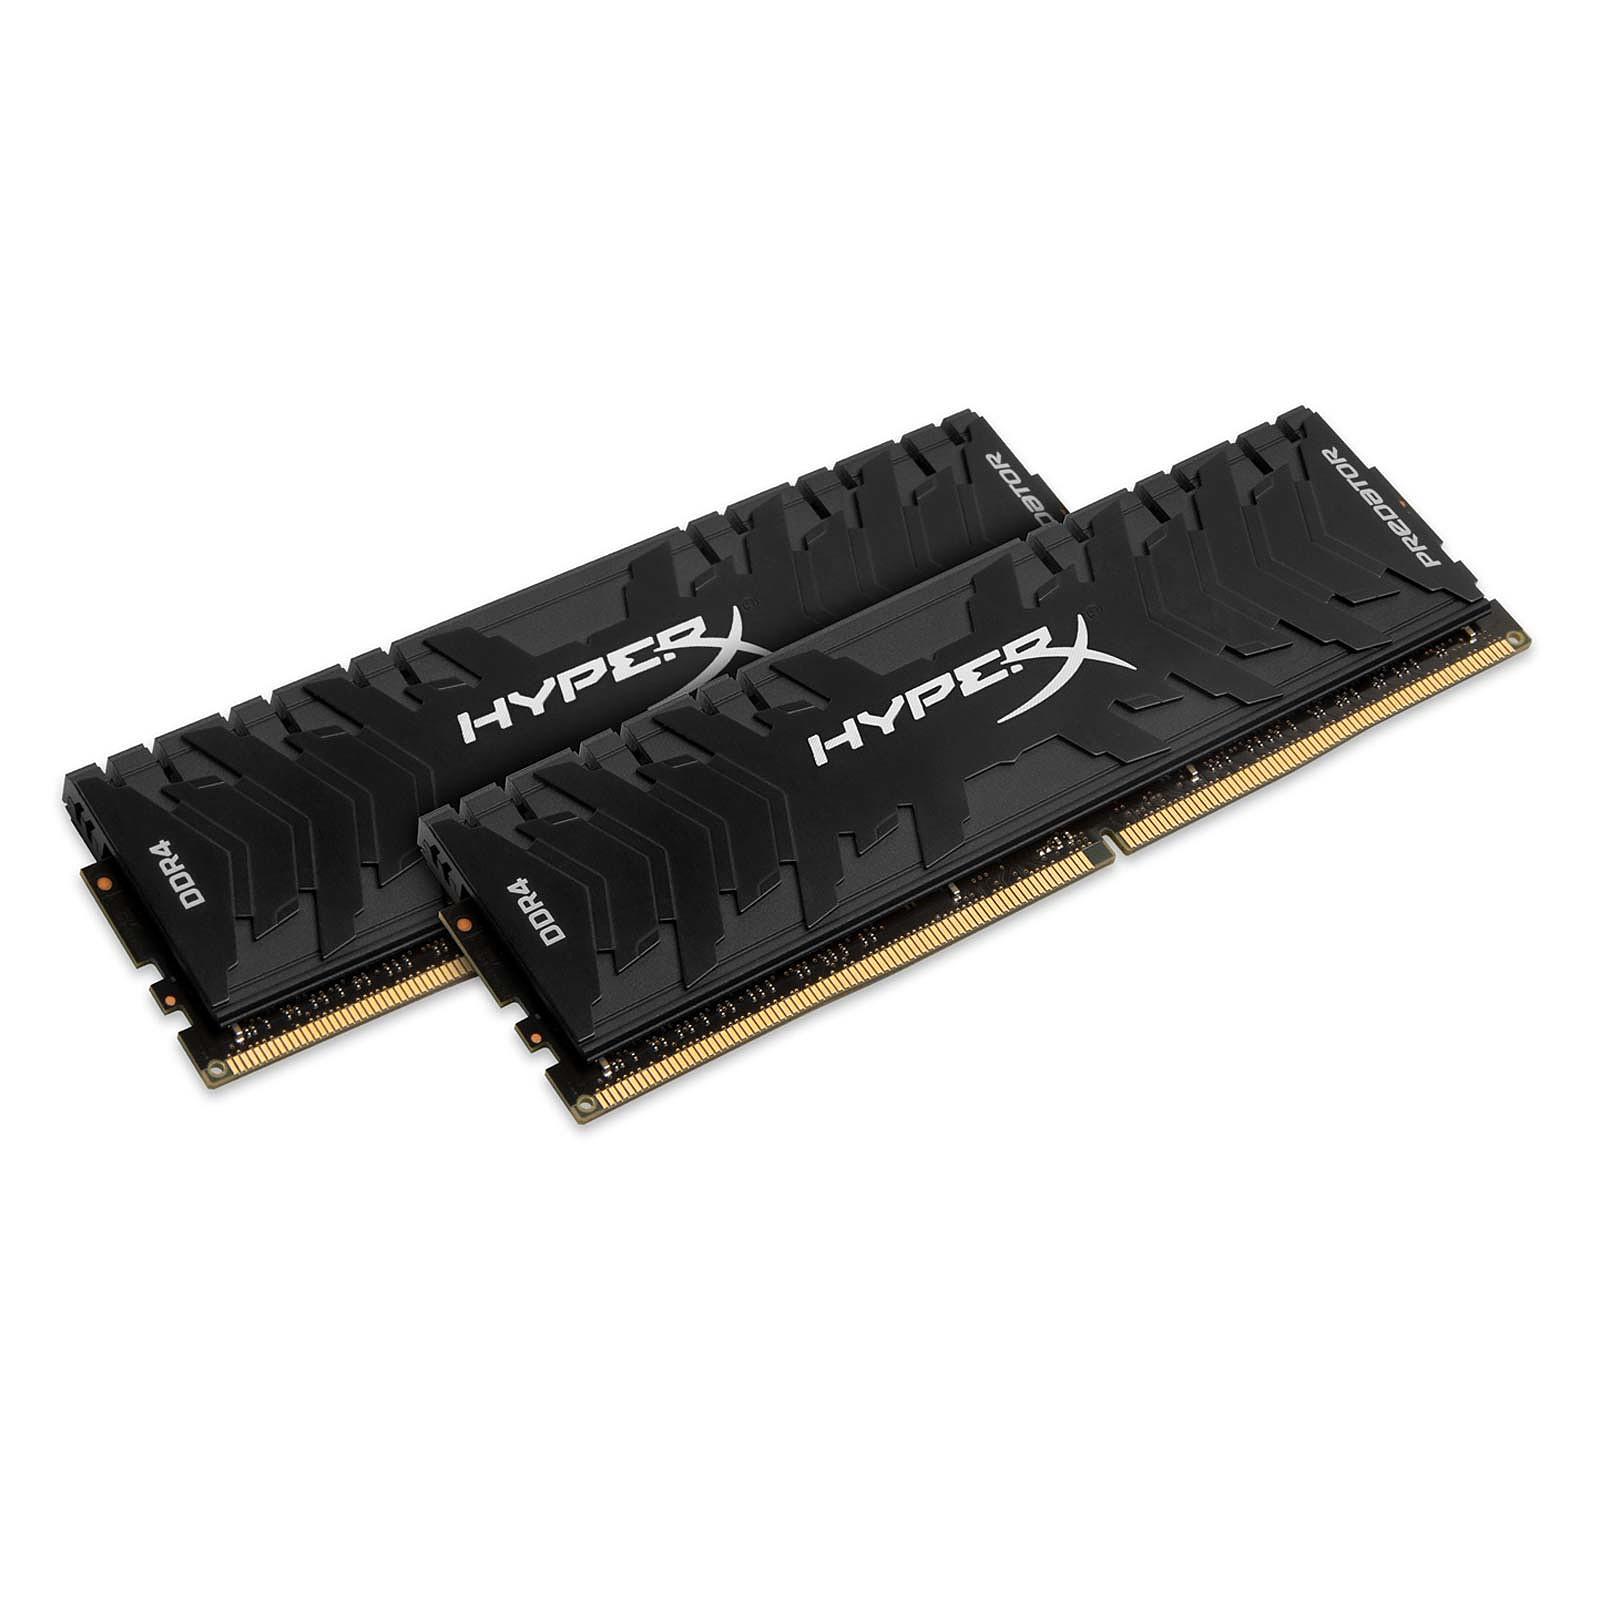 HyperX Predator Noir 8 Go (2x 4 Go) DDR4 3200 MHz CL16